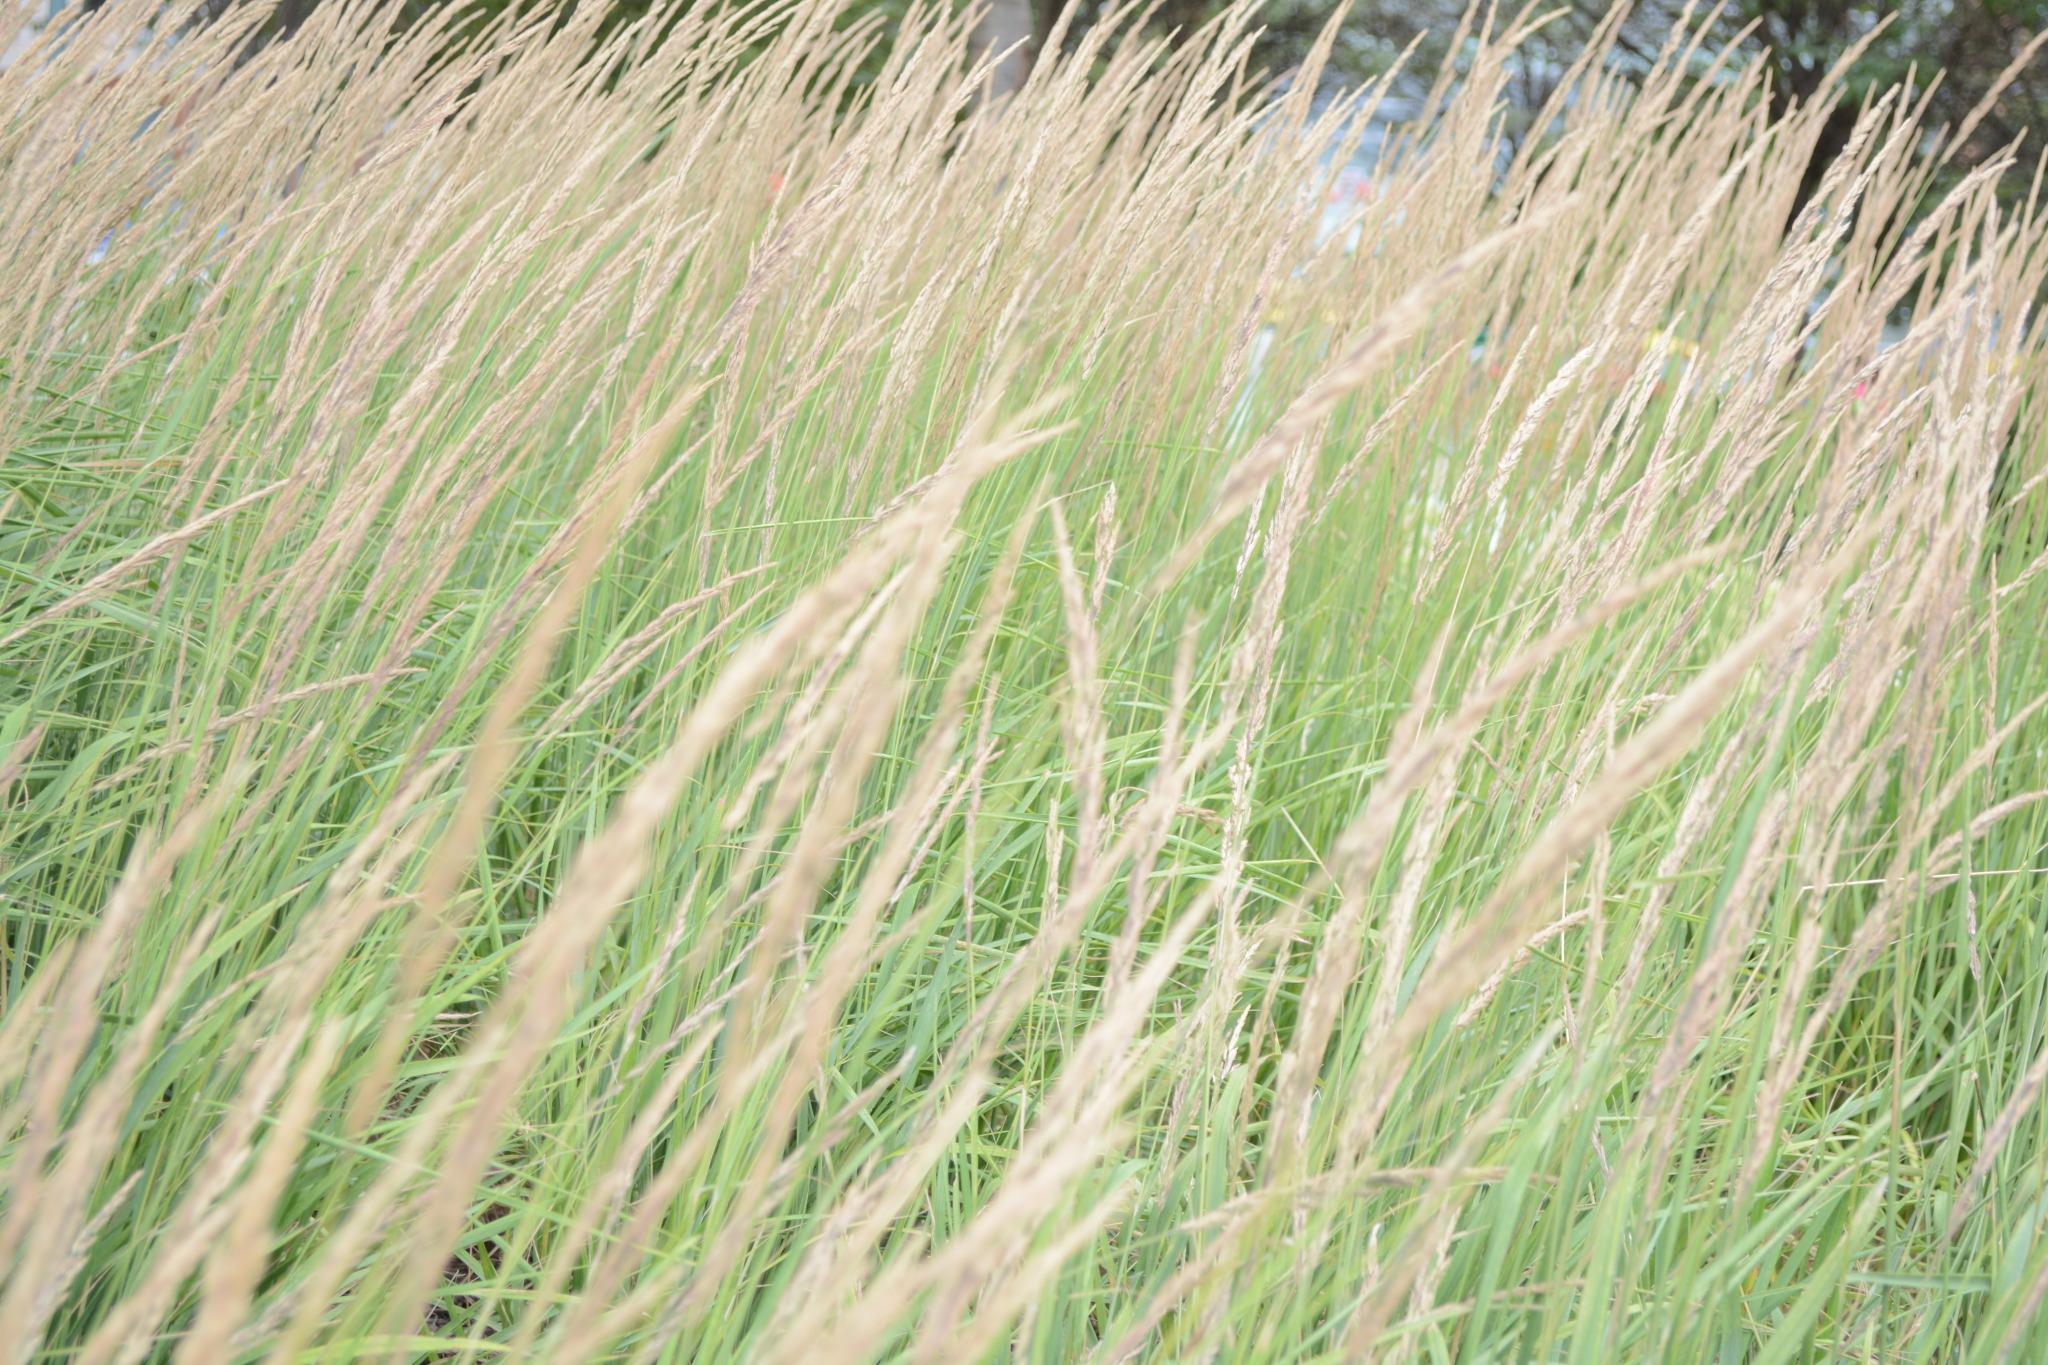 Unveiled_nature photo.jpg